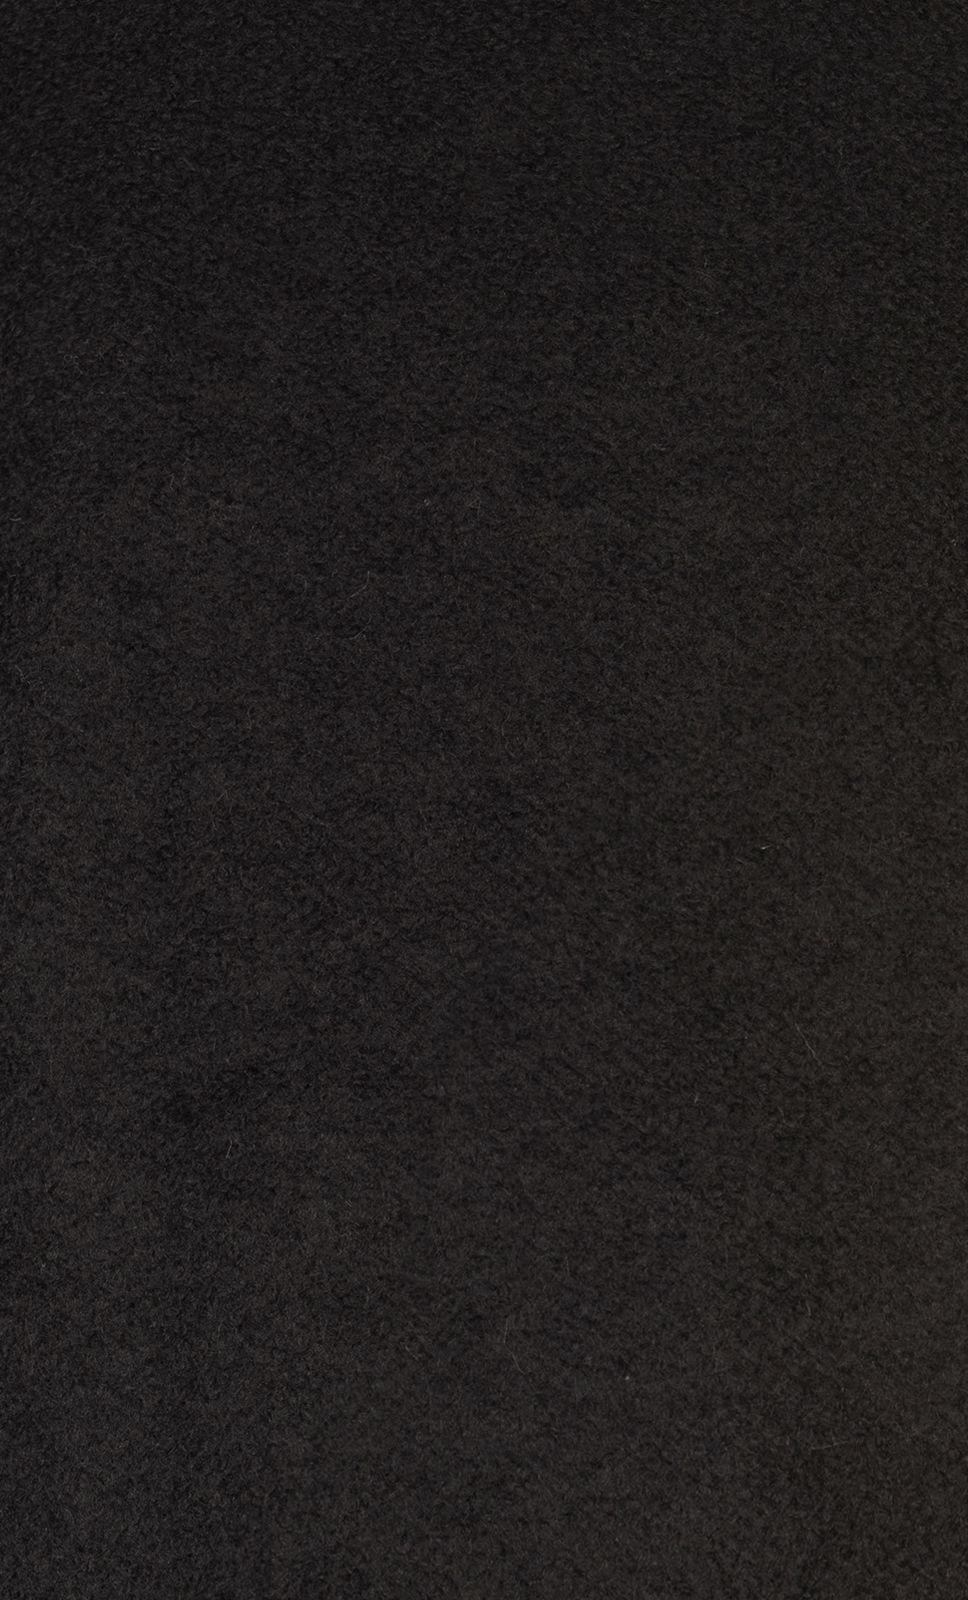 Razzmataz-Black